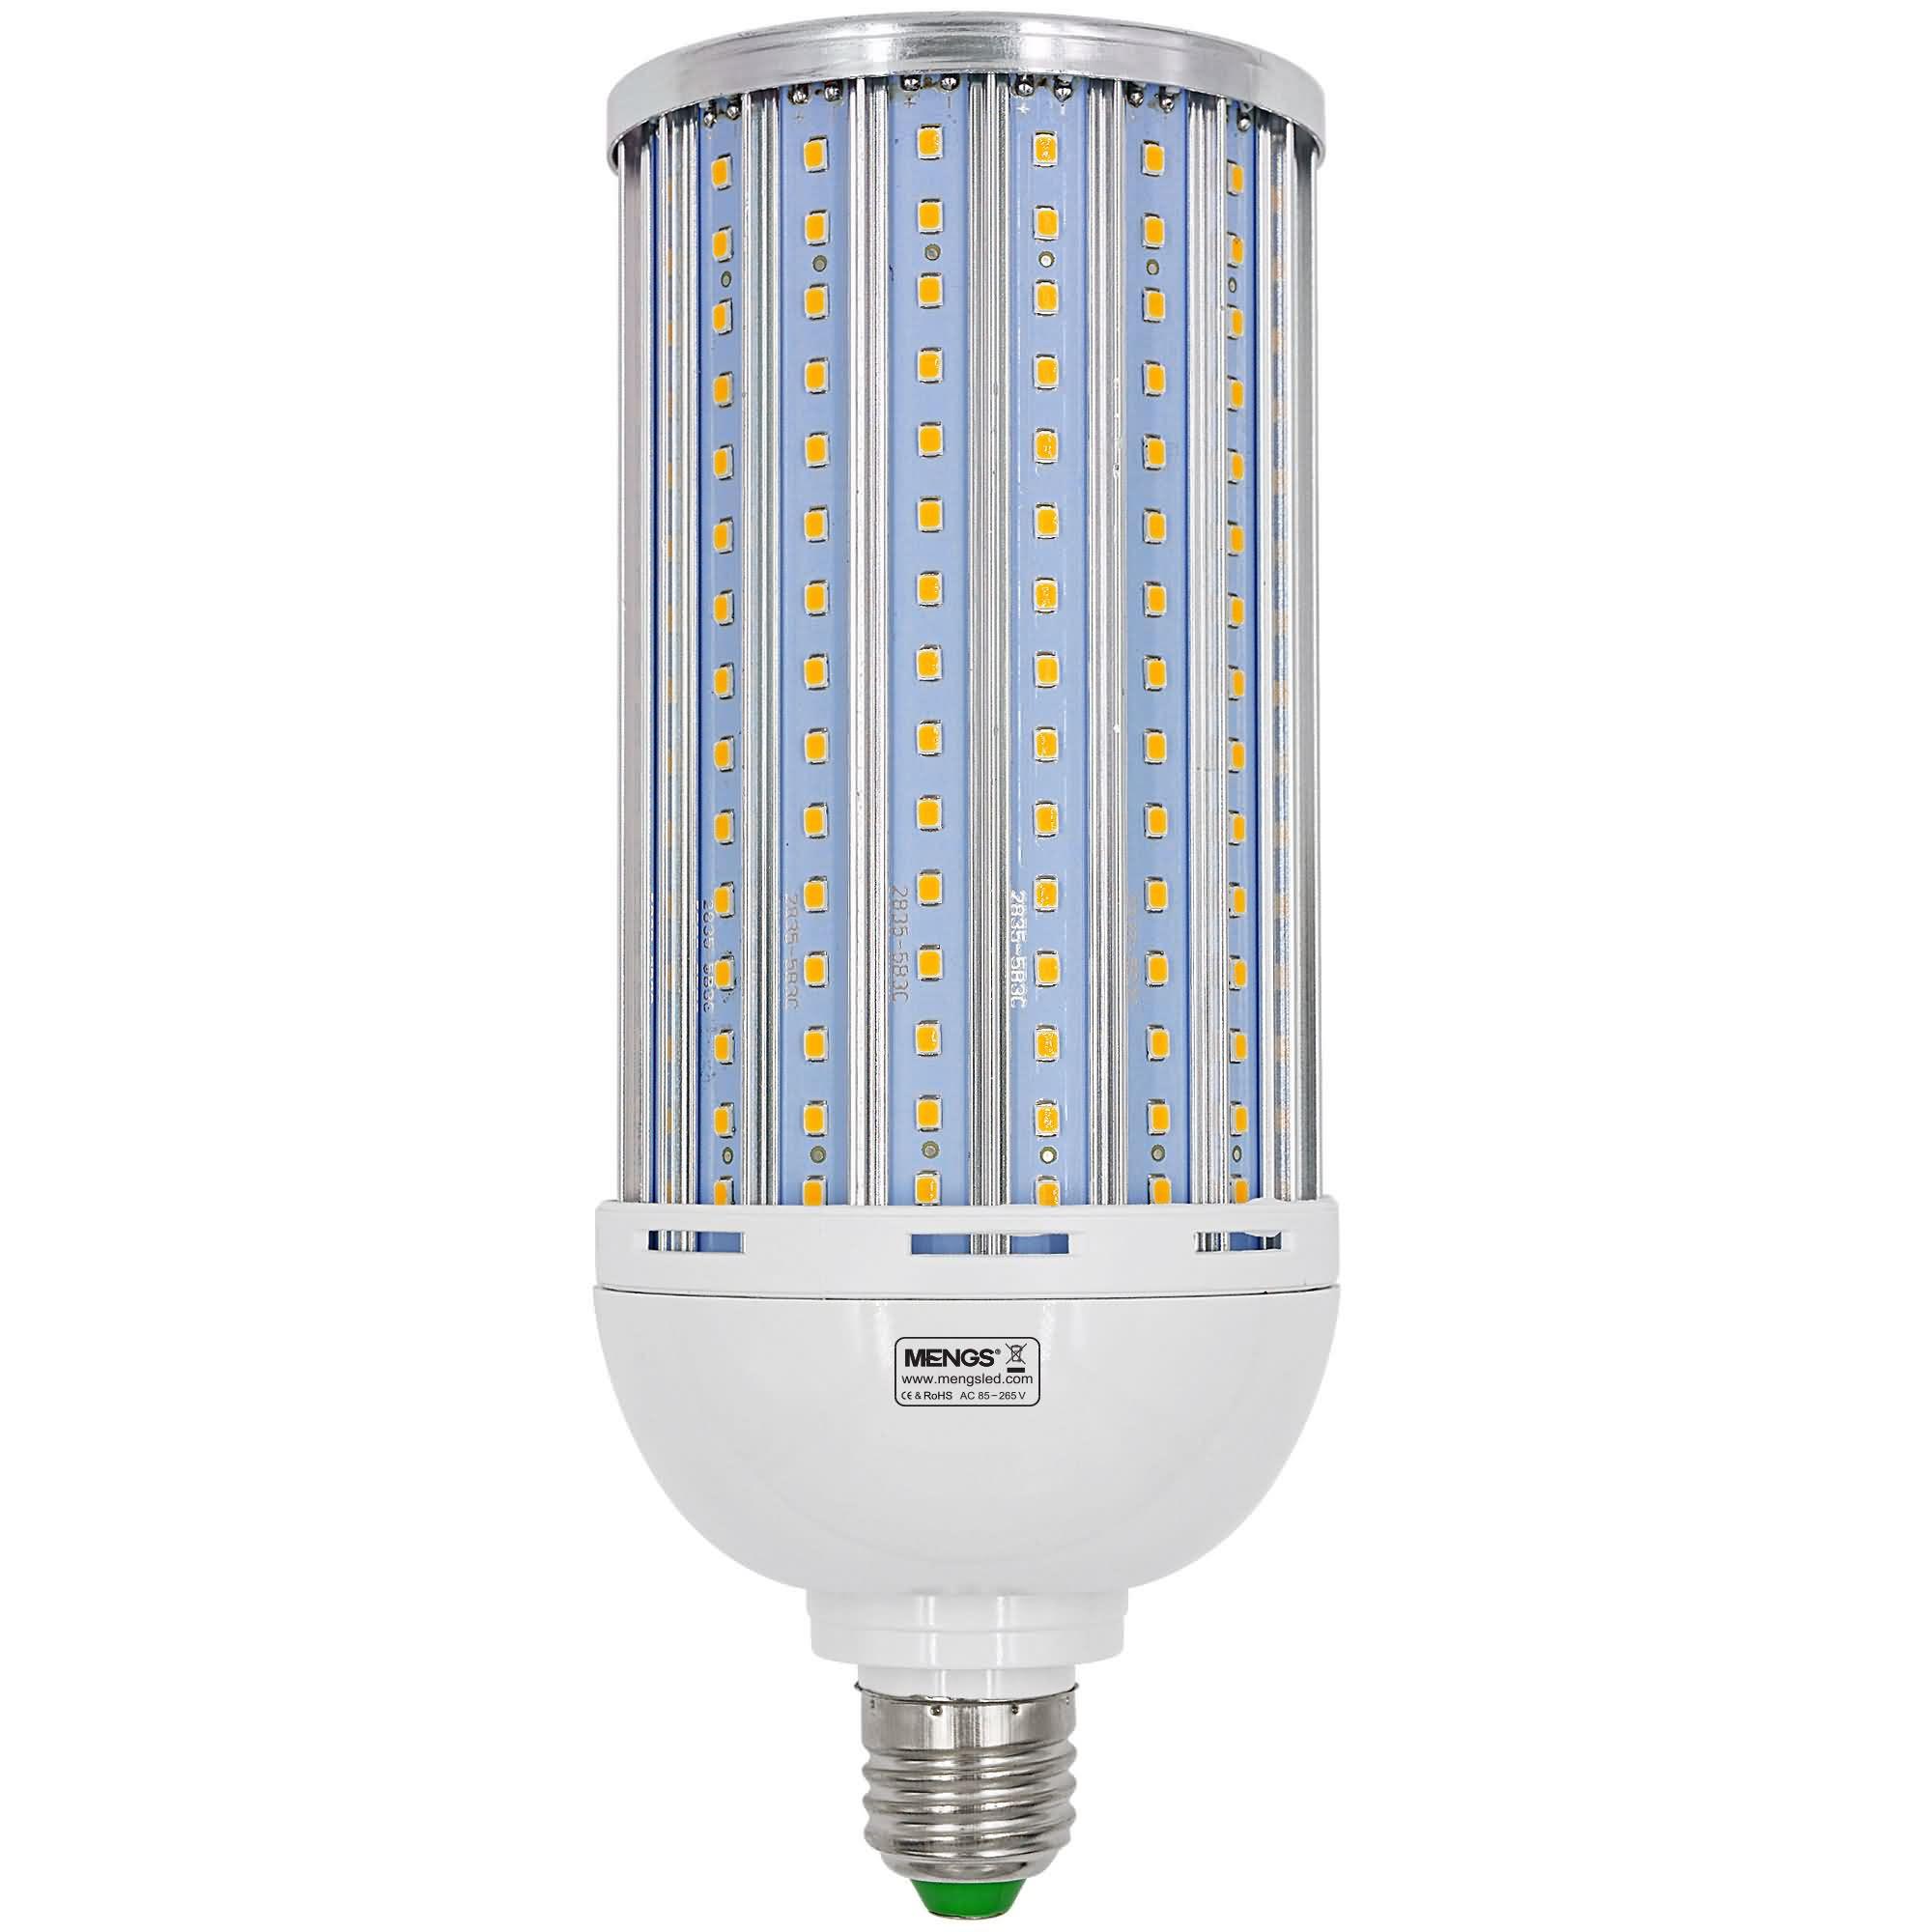 MENGS® E27 65W LED Corn Light 300x 2835 SMD LED Bulb Lamp In Warm White Energy-Saving Light